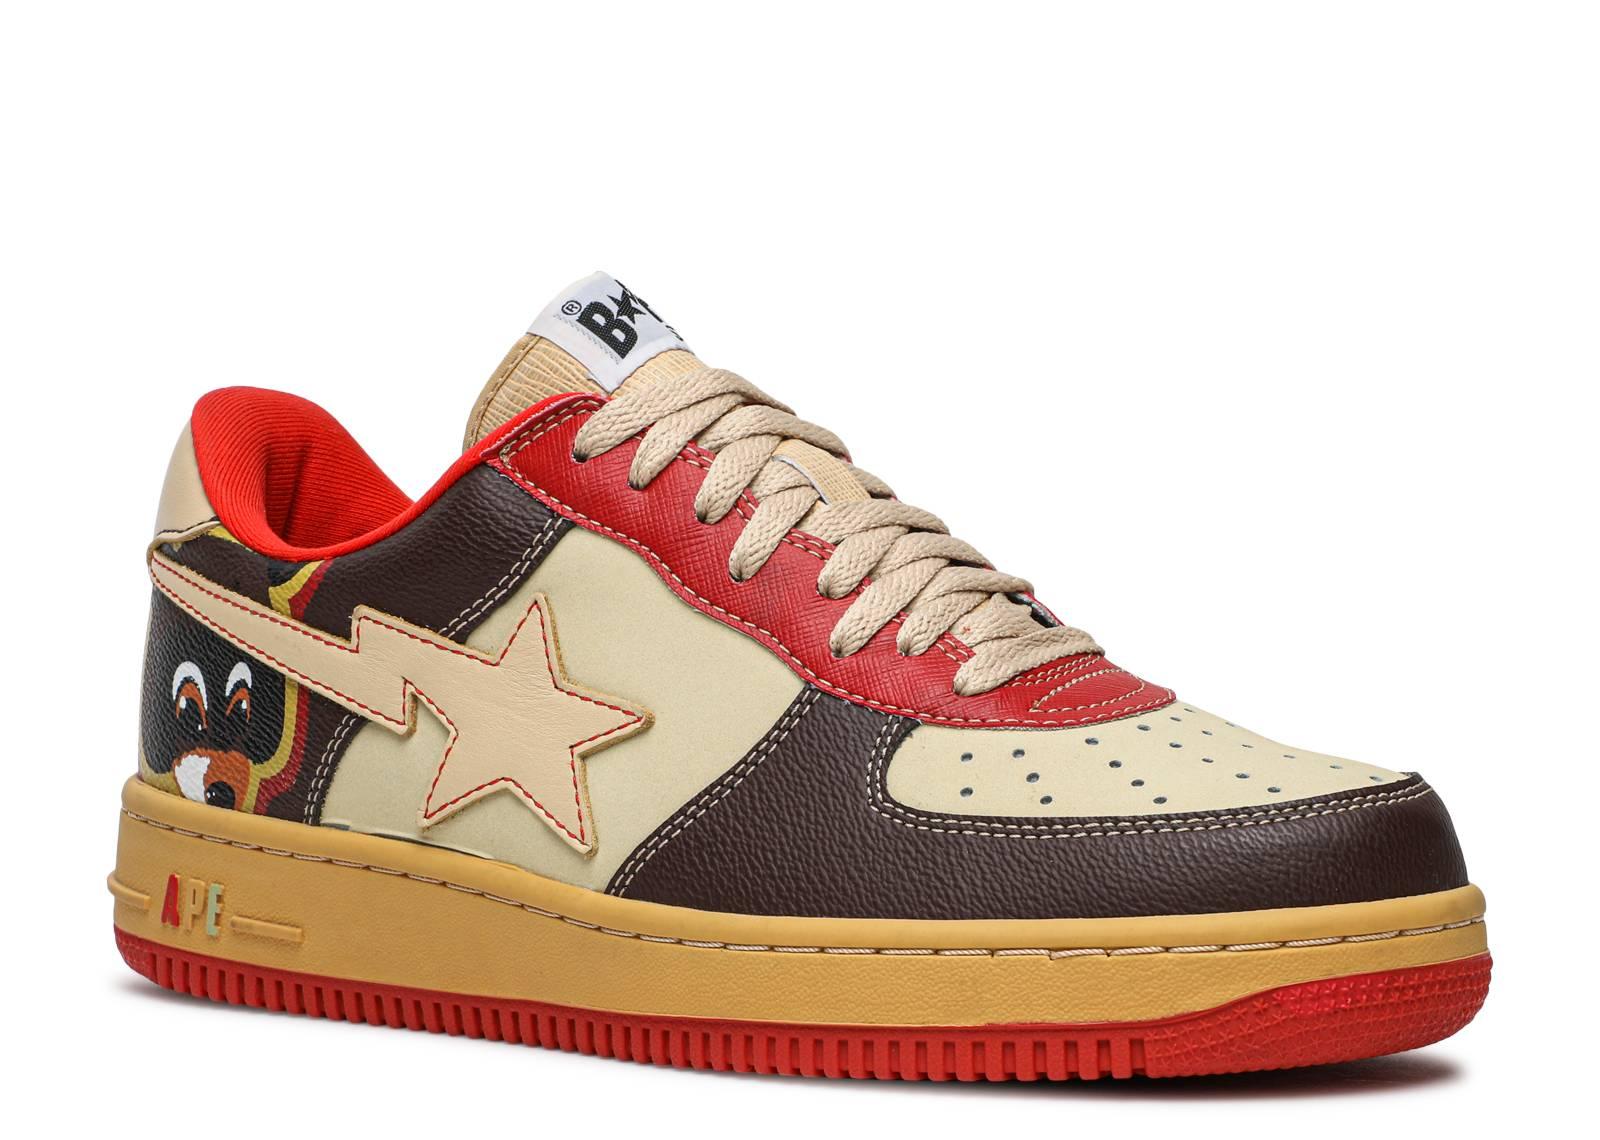 7647cb82085 kanye west bape shoes